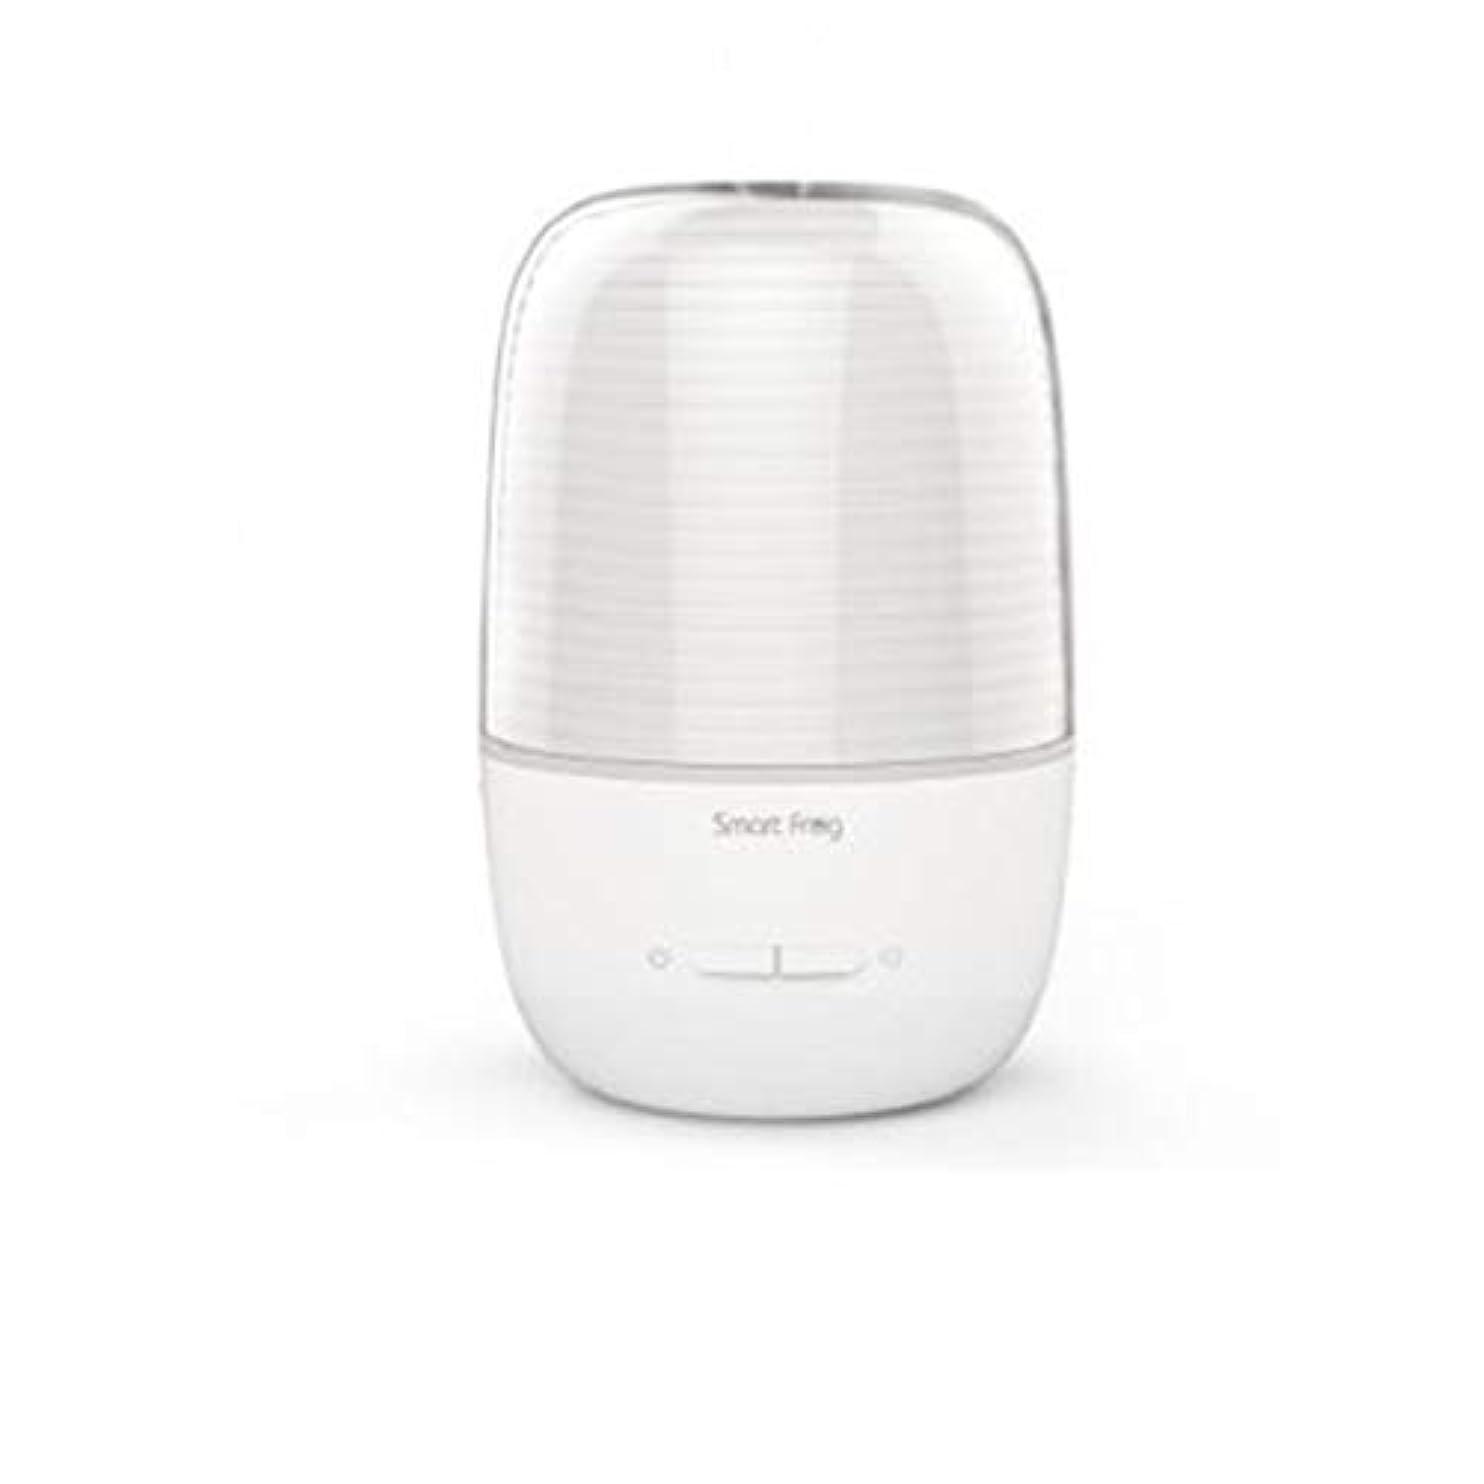 130ml超音波冷たい霧の加湿器の変更家のヨガのオフィスの鉱泉の寝室の拡散器 (Color : White)